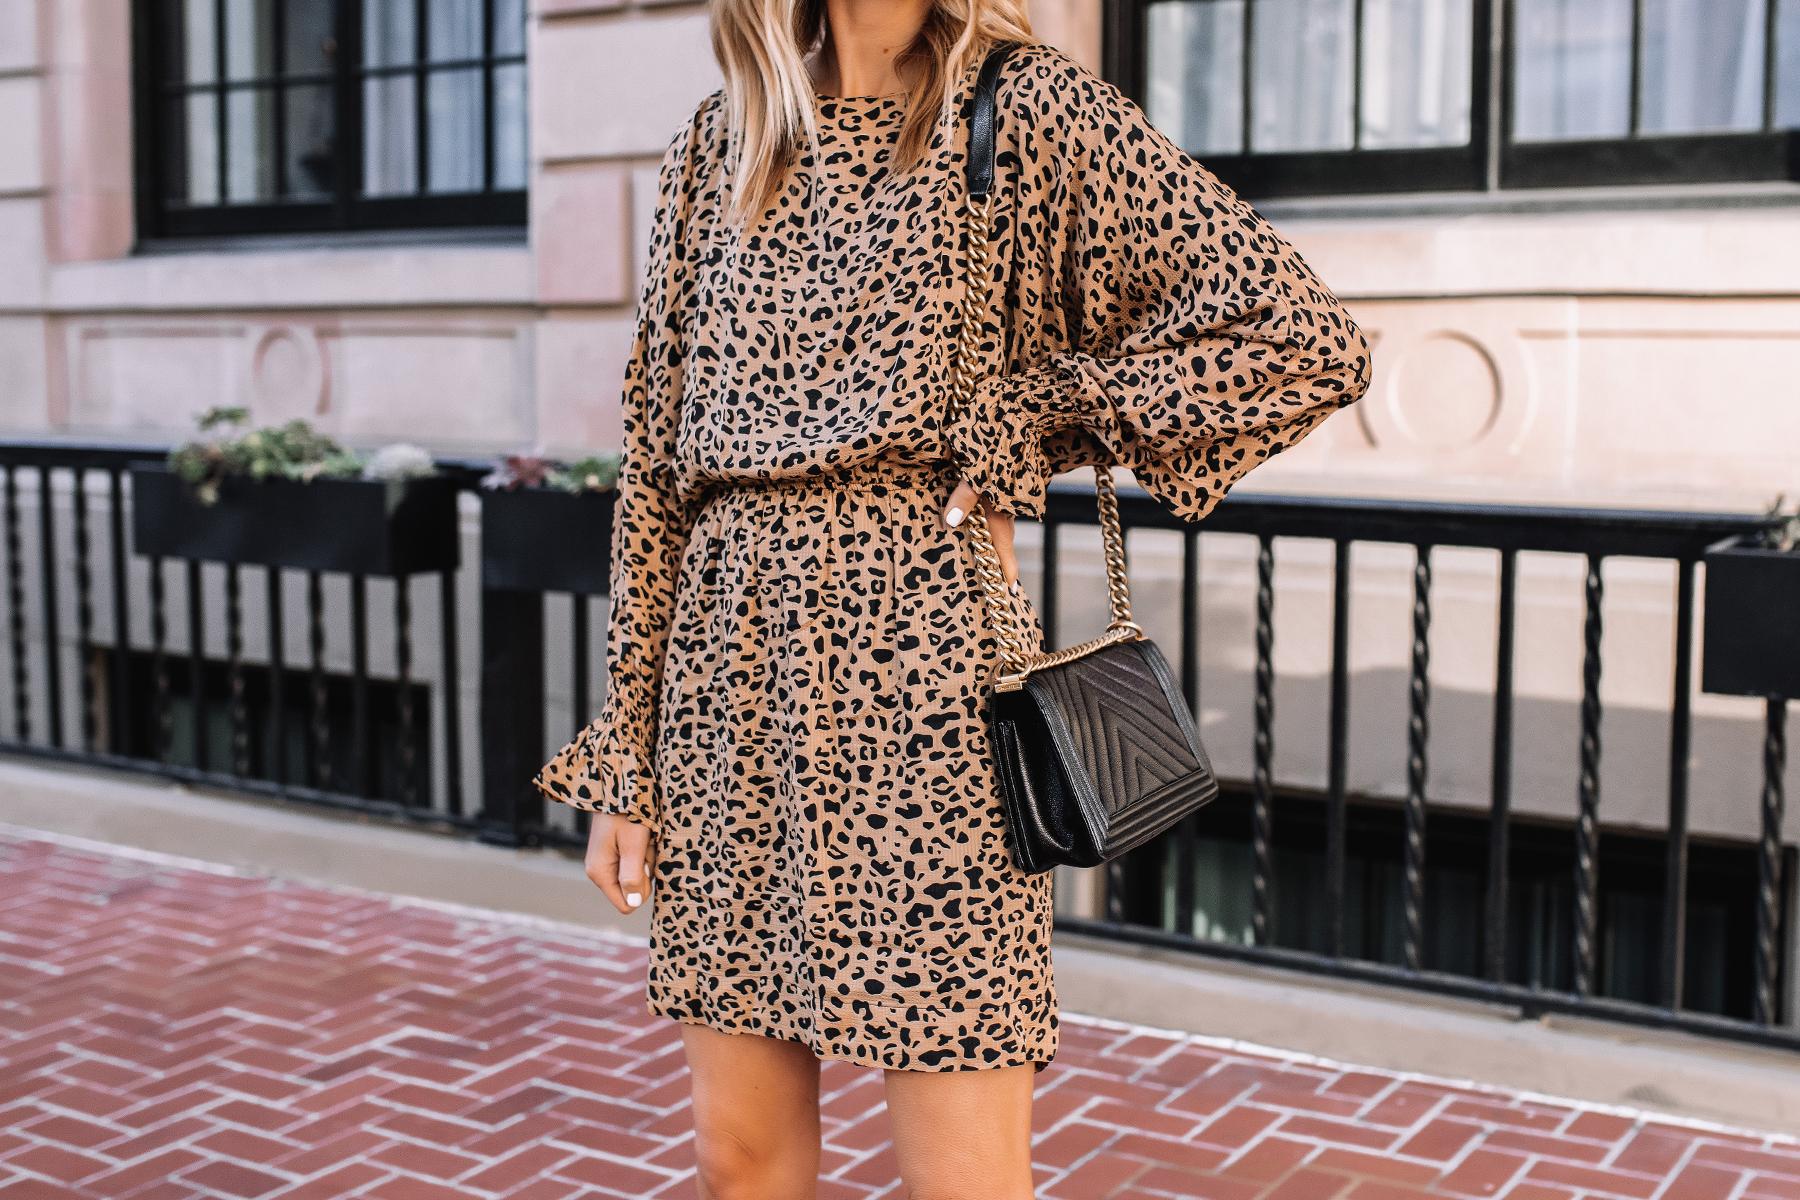 Fashion Jackson Wearing Baum und Pferdgarten Aemiley Drape Leopard Mini Dress 1